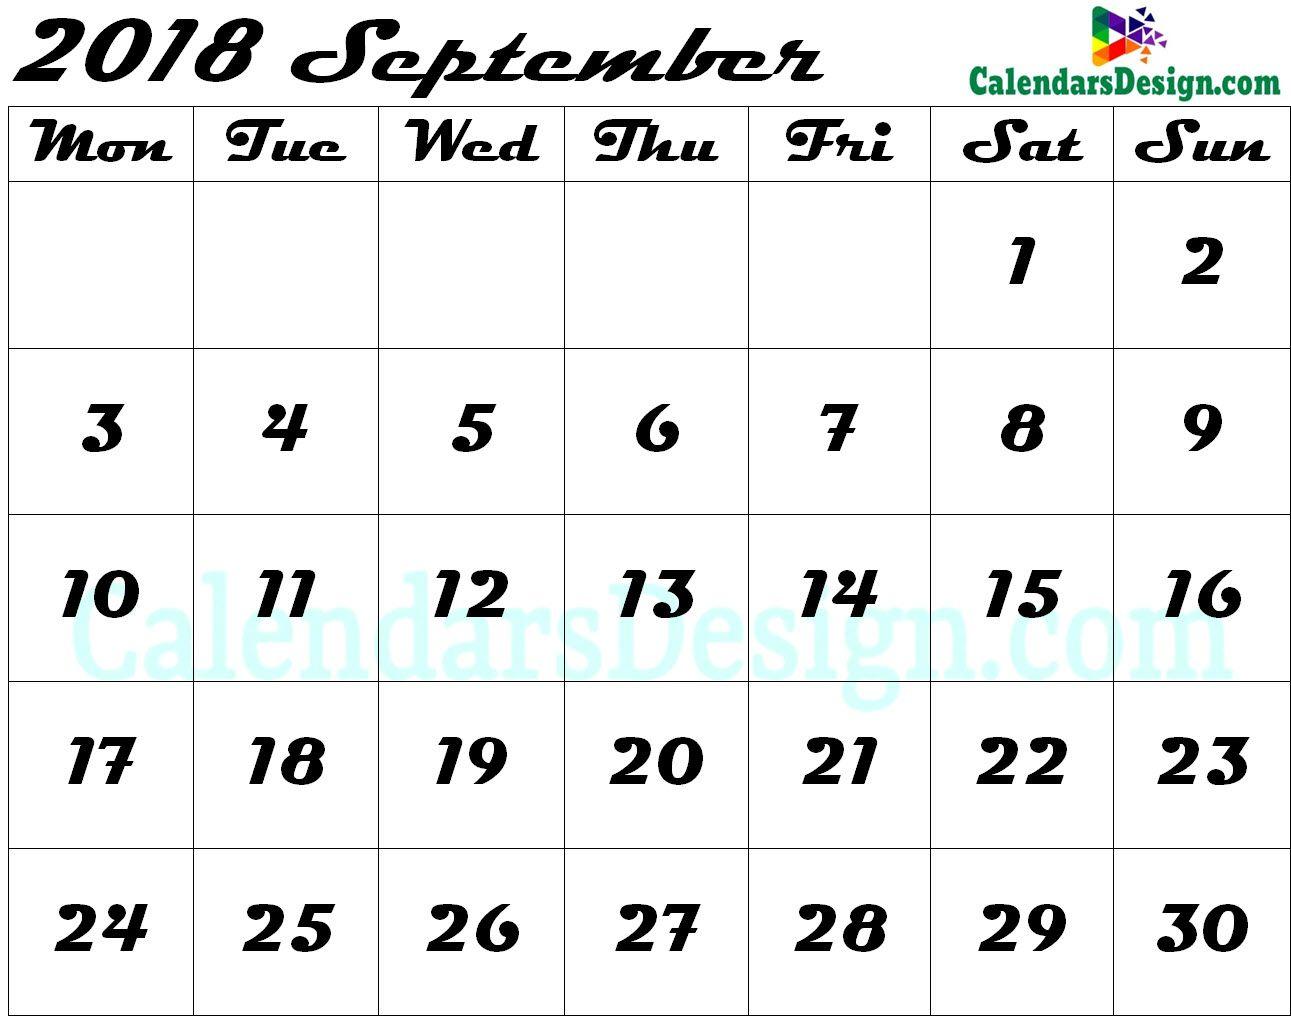 Editable September 2018 Calendar Blank Template   Calendar